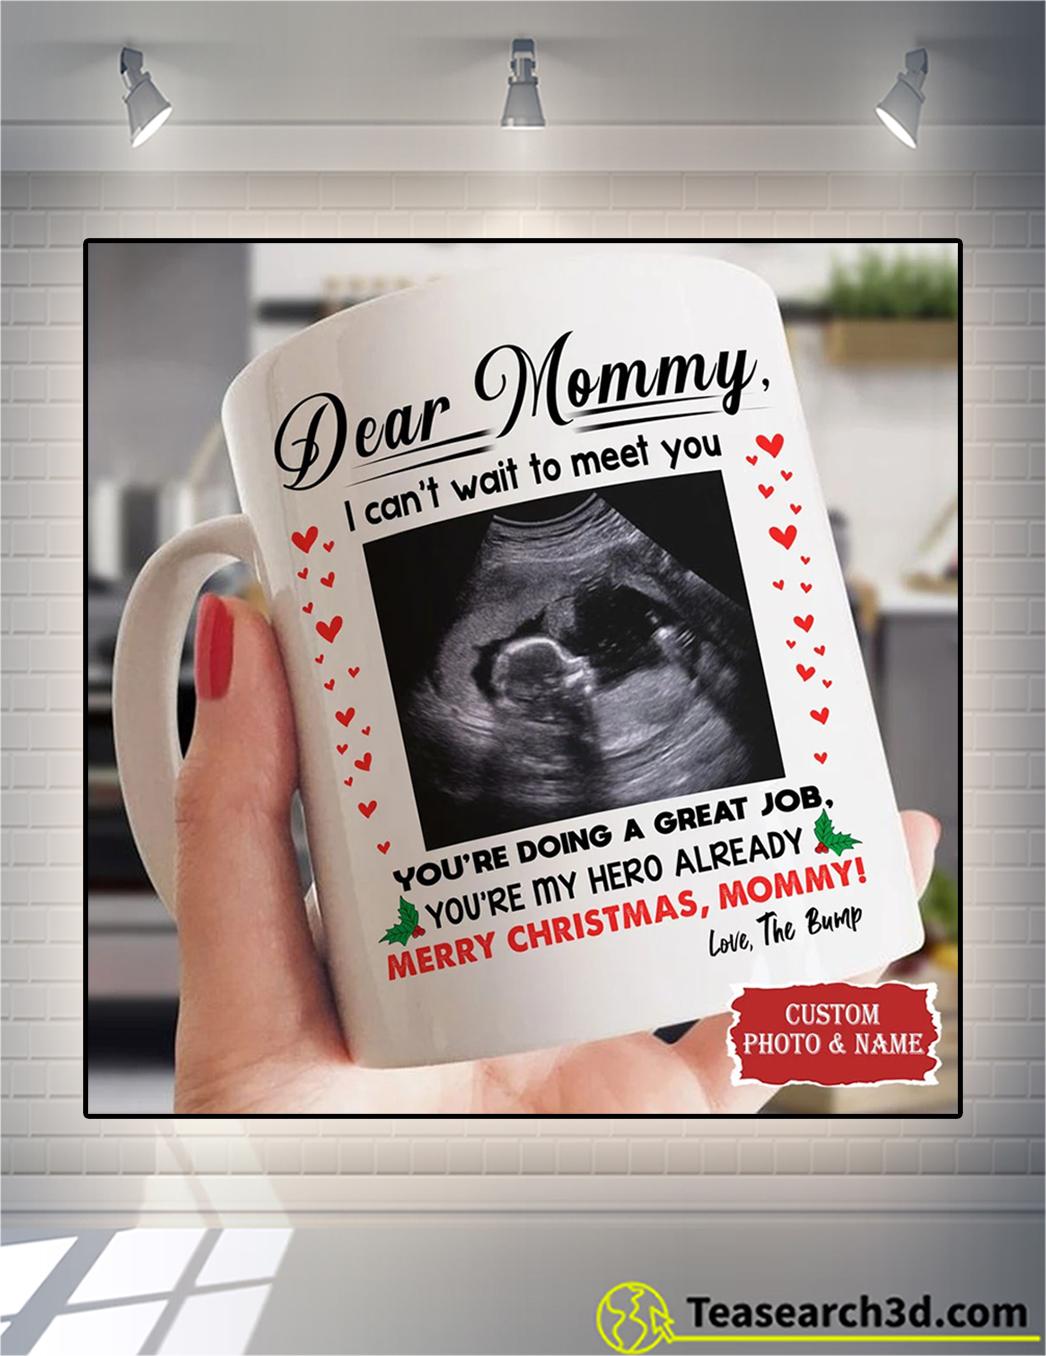 Dear mommy I can't wait to meet you custom photo and name mug 11oz